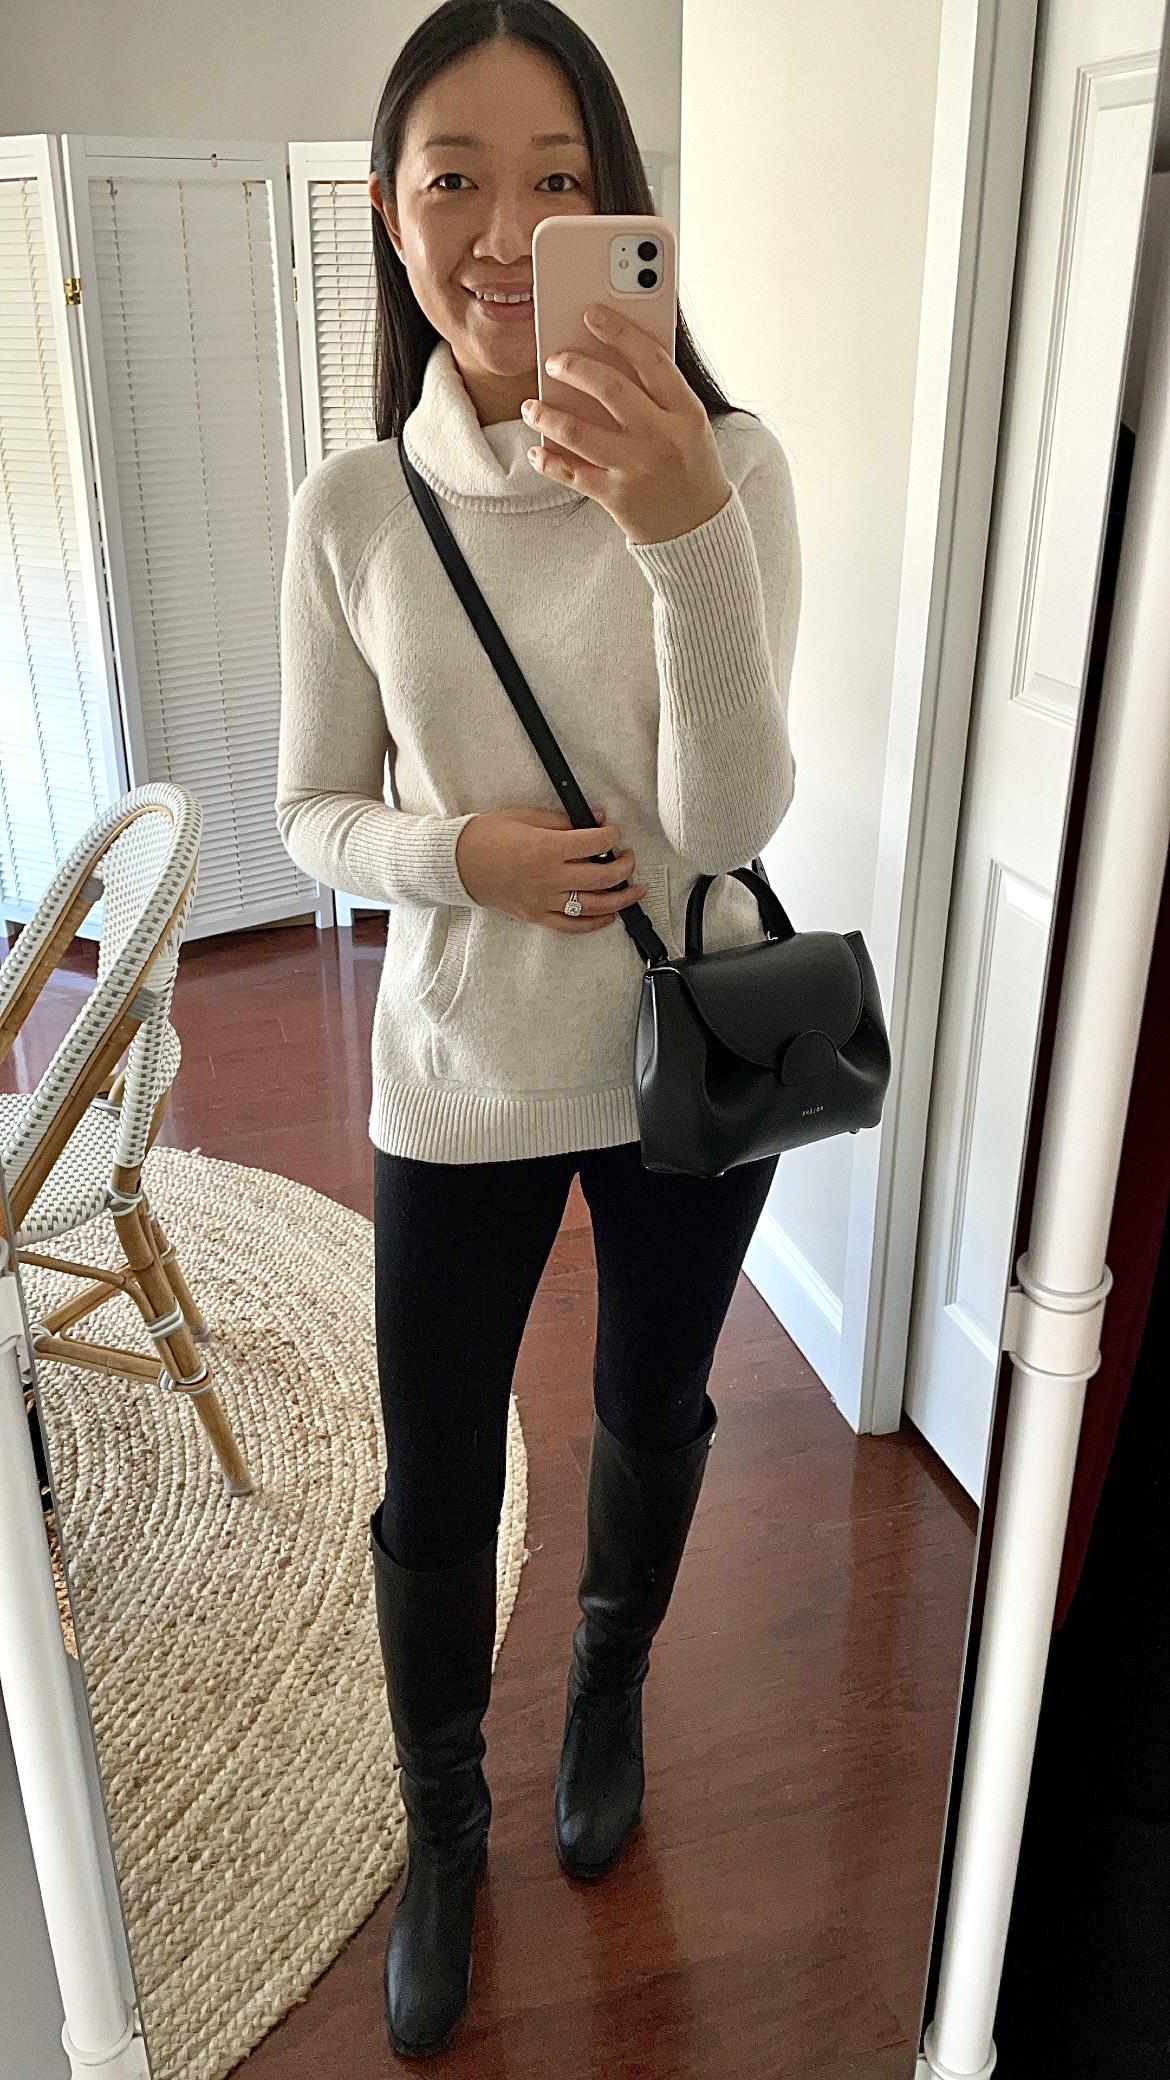 LOFT Cowl Neck Pocket Sweater, size XS regular